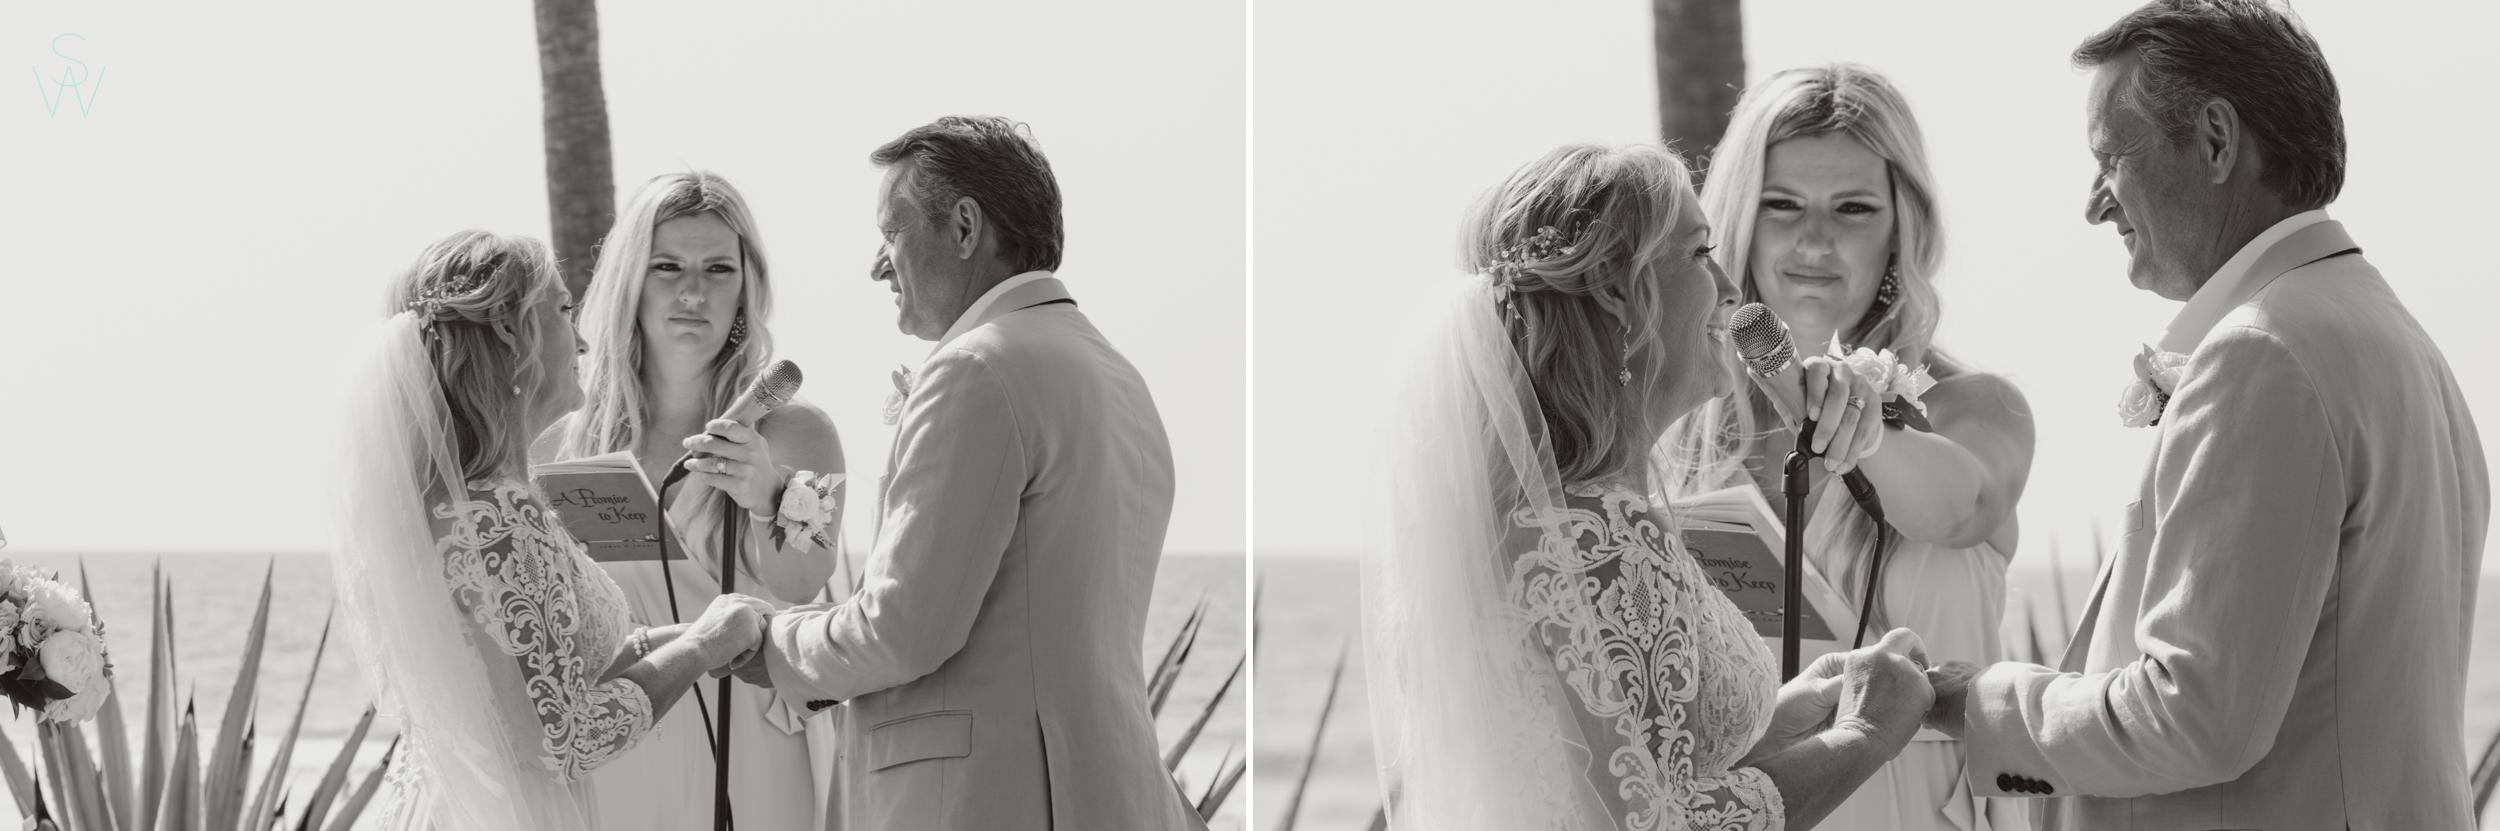 118DEL.MAR.WEDDINGS.photography.shewanders.JPG